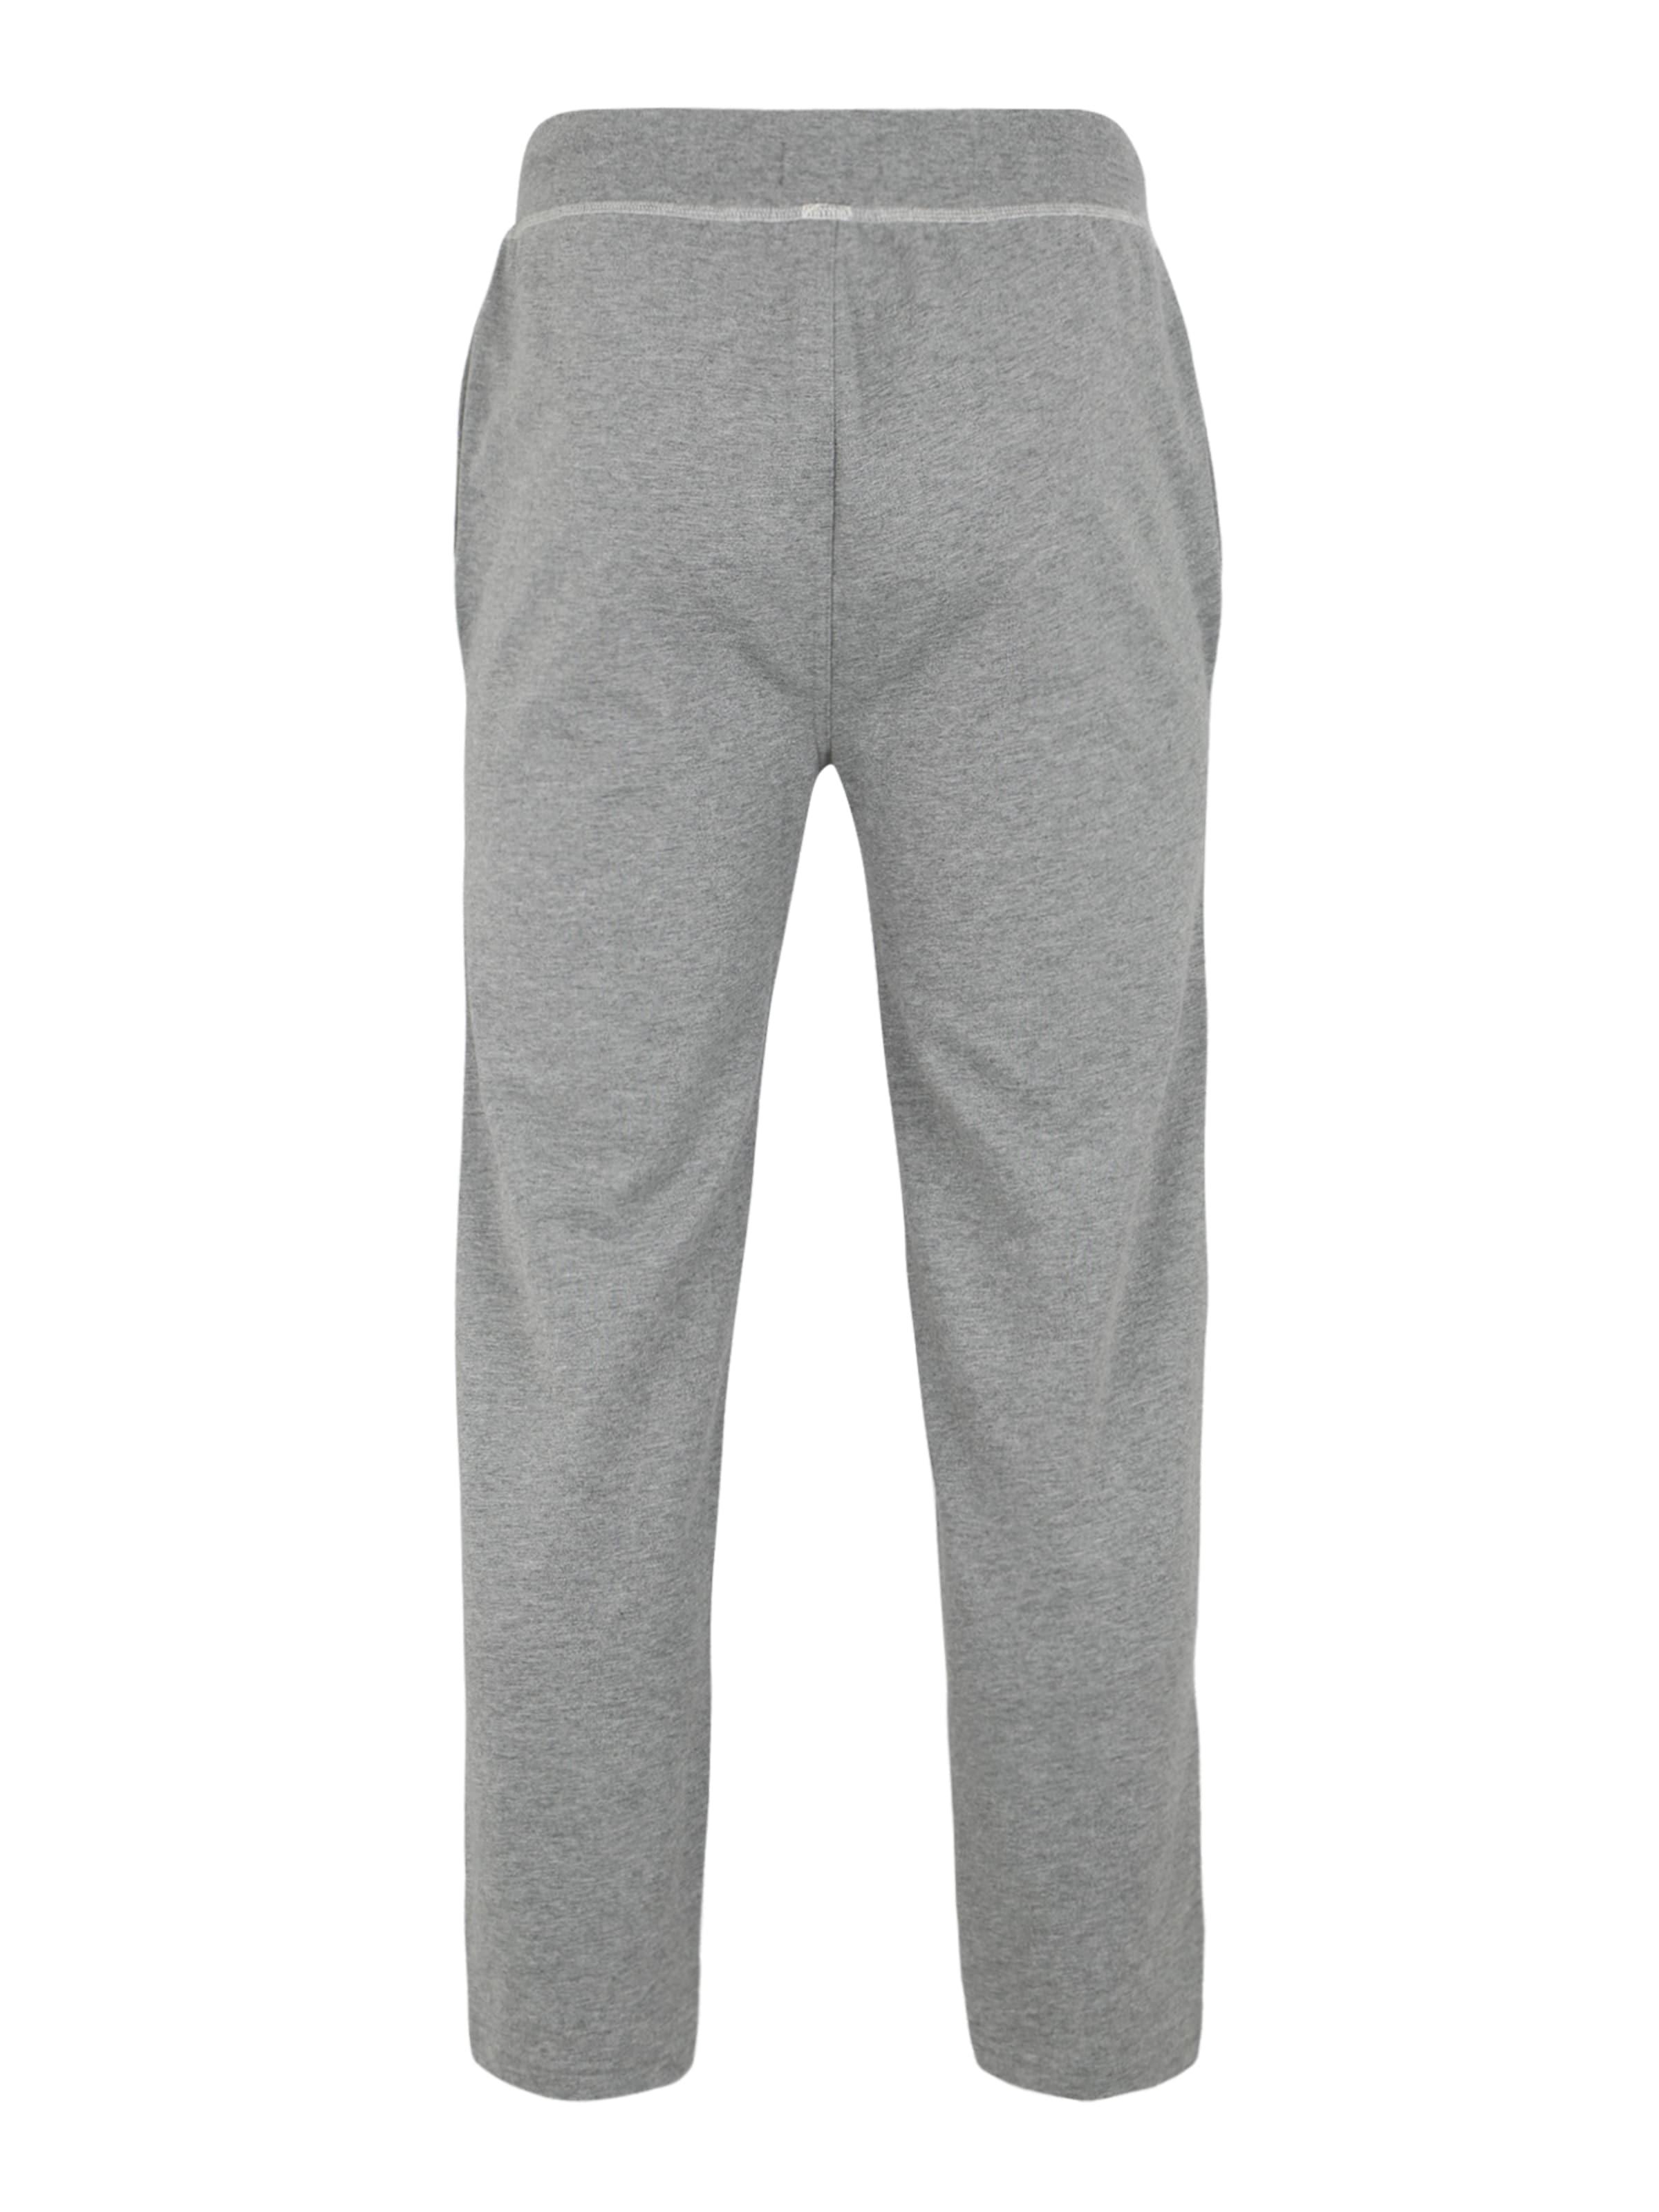 De Lauren En Ralph Polo Pyjama Gris Pantalon PZn0OkN8wX